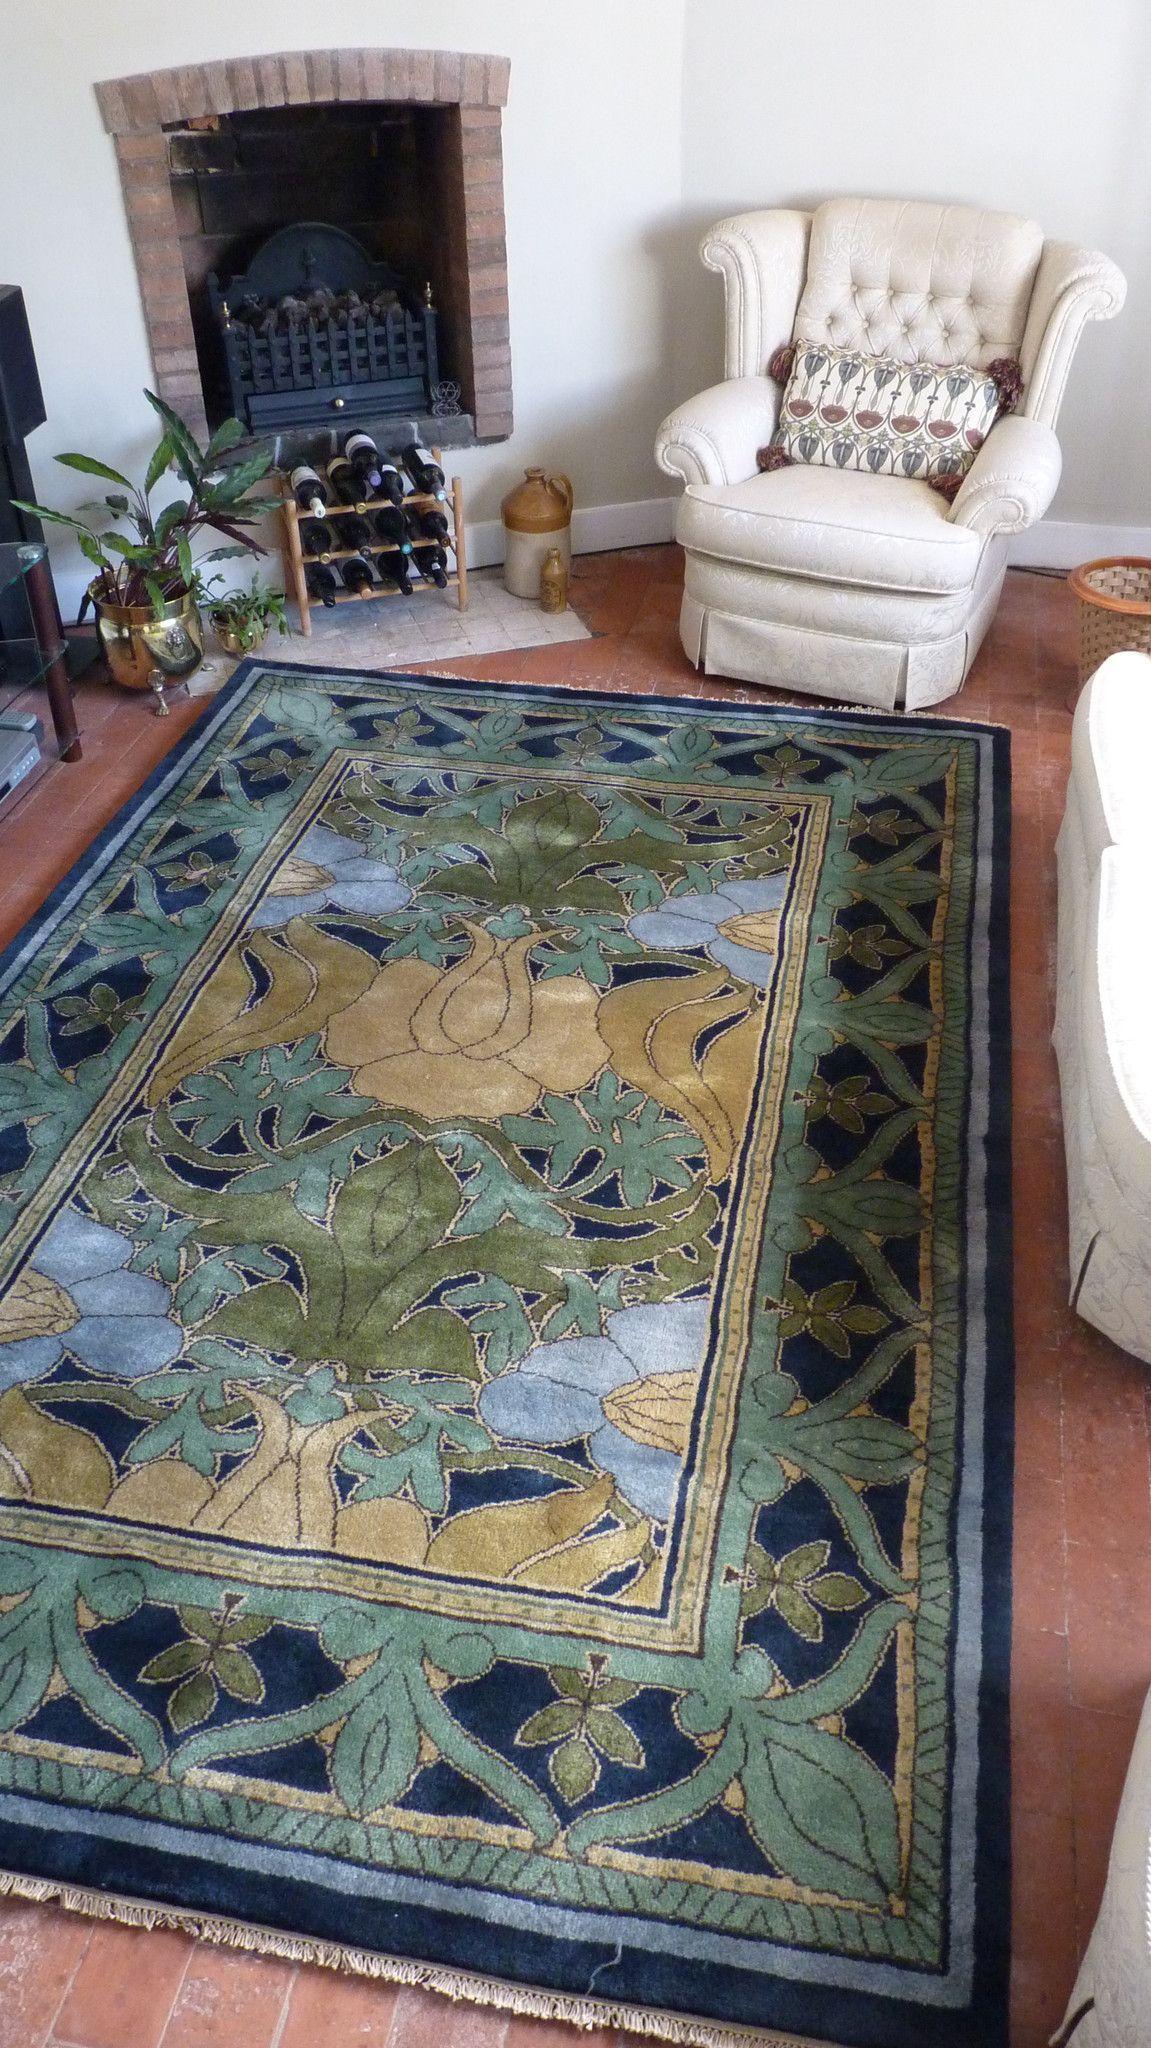 Donnemara 1 in 2020 Custom rugs, Craftsman interior